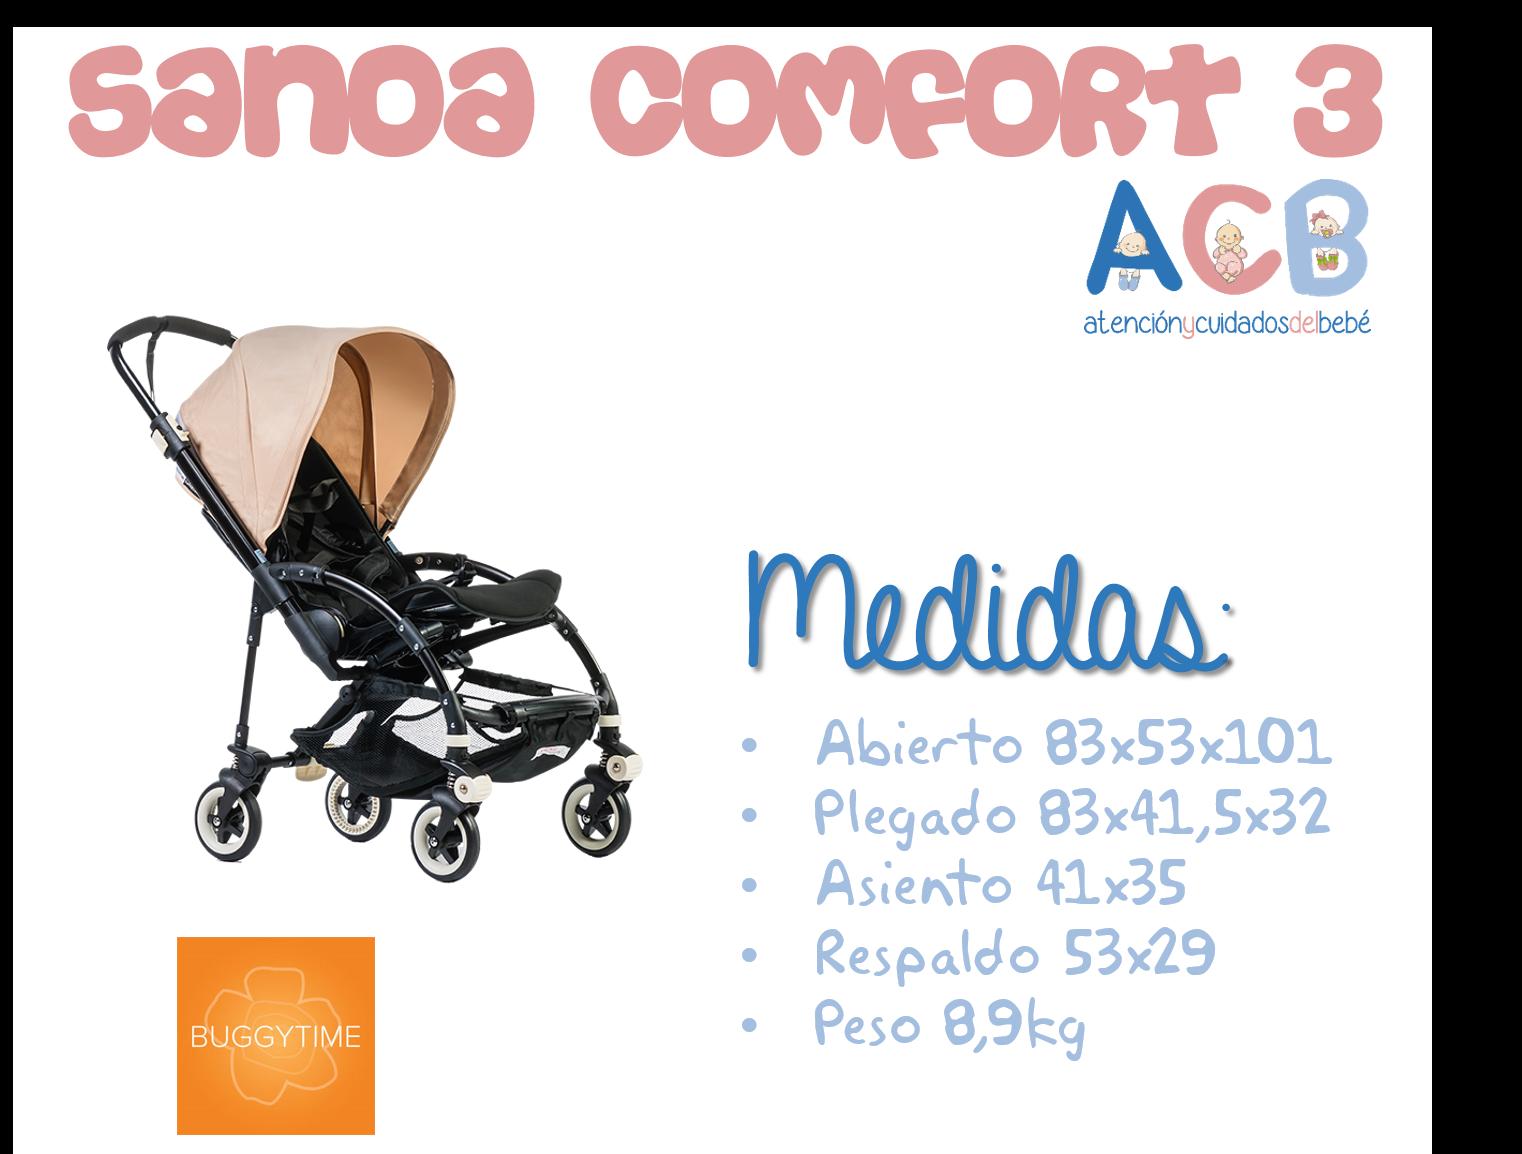 medidas-sanoa-comfort-3